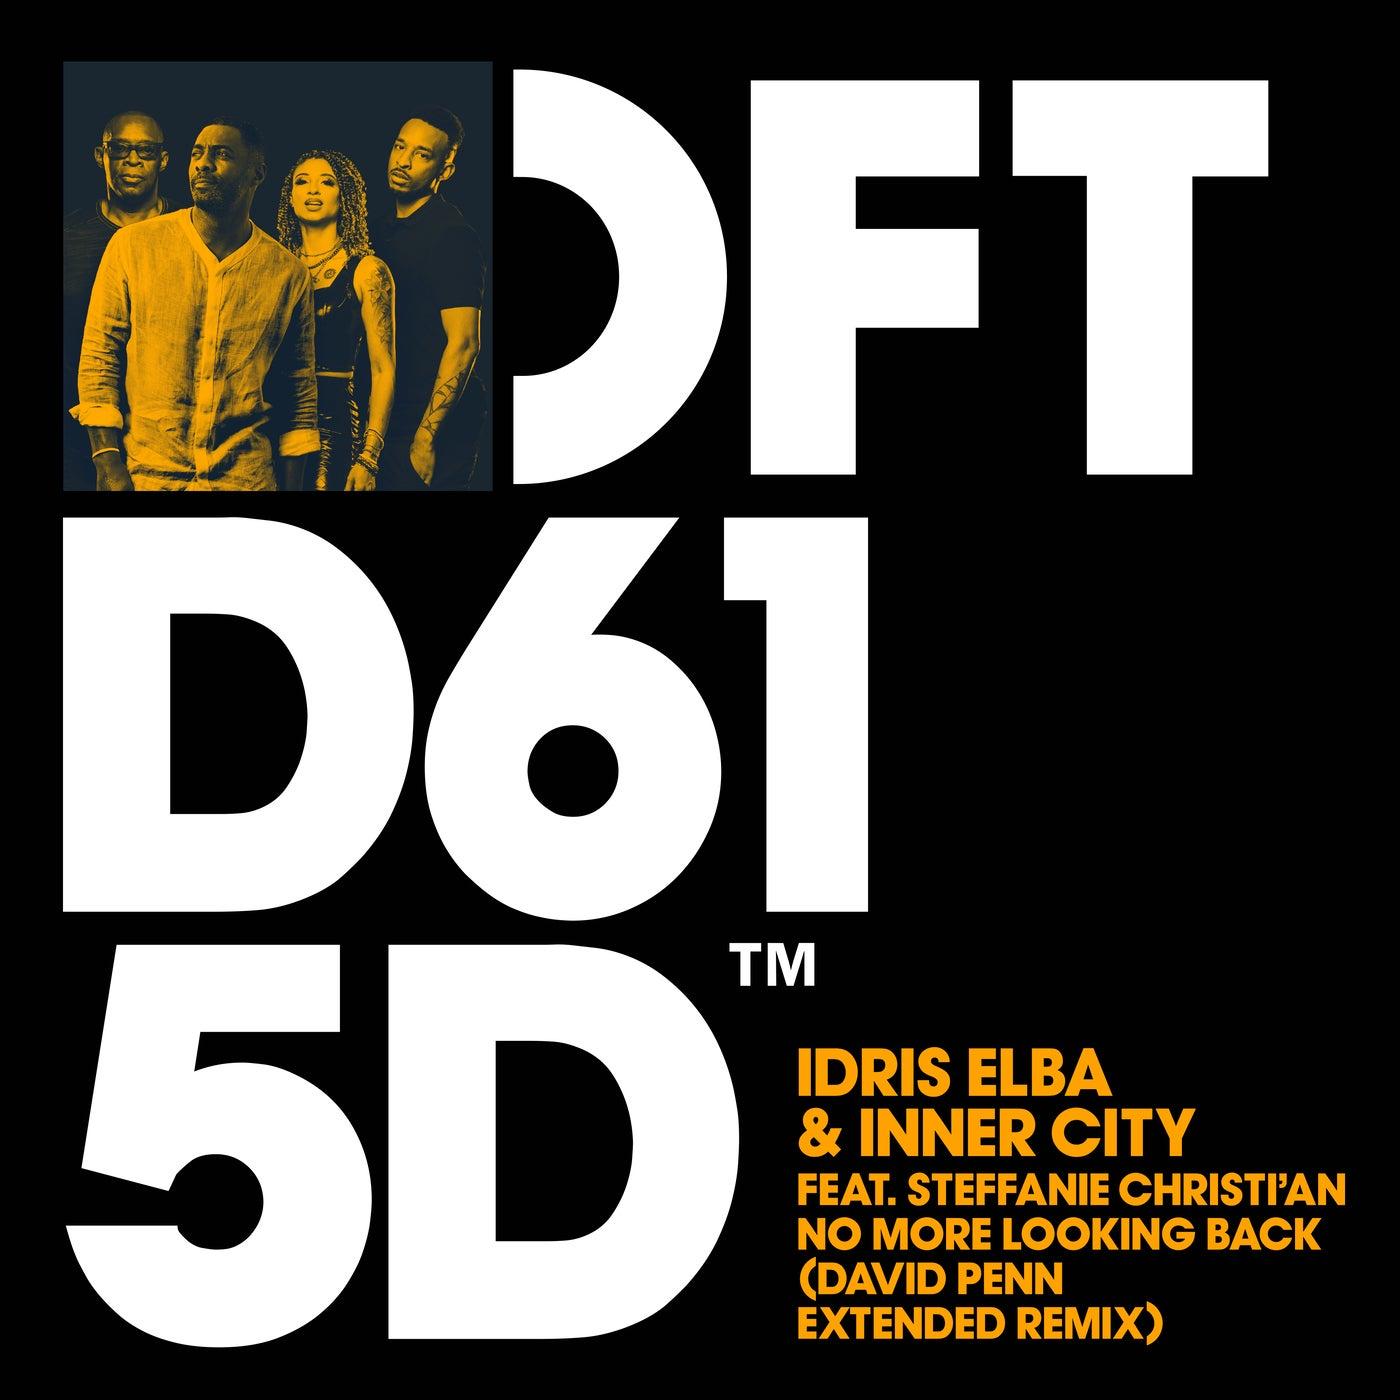 No More Looking Back feat. Steffanie Christi'an (David Penn Extended Remix)